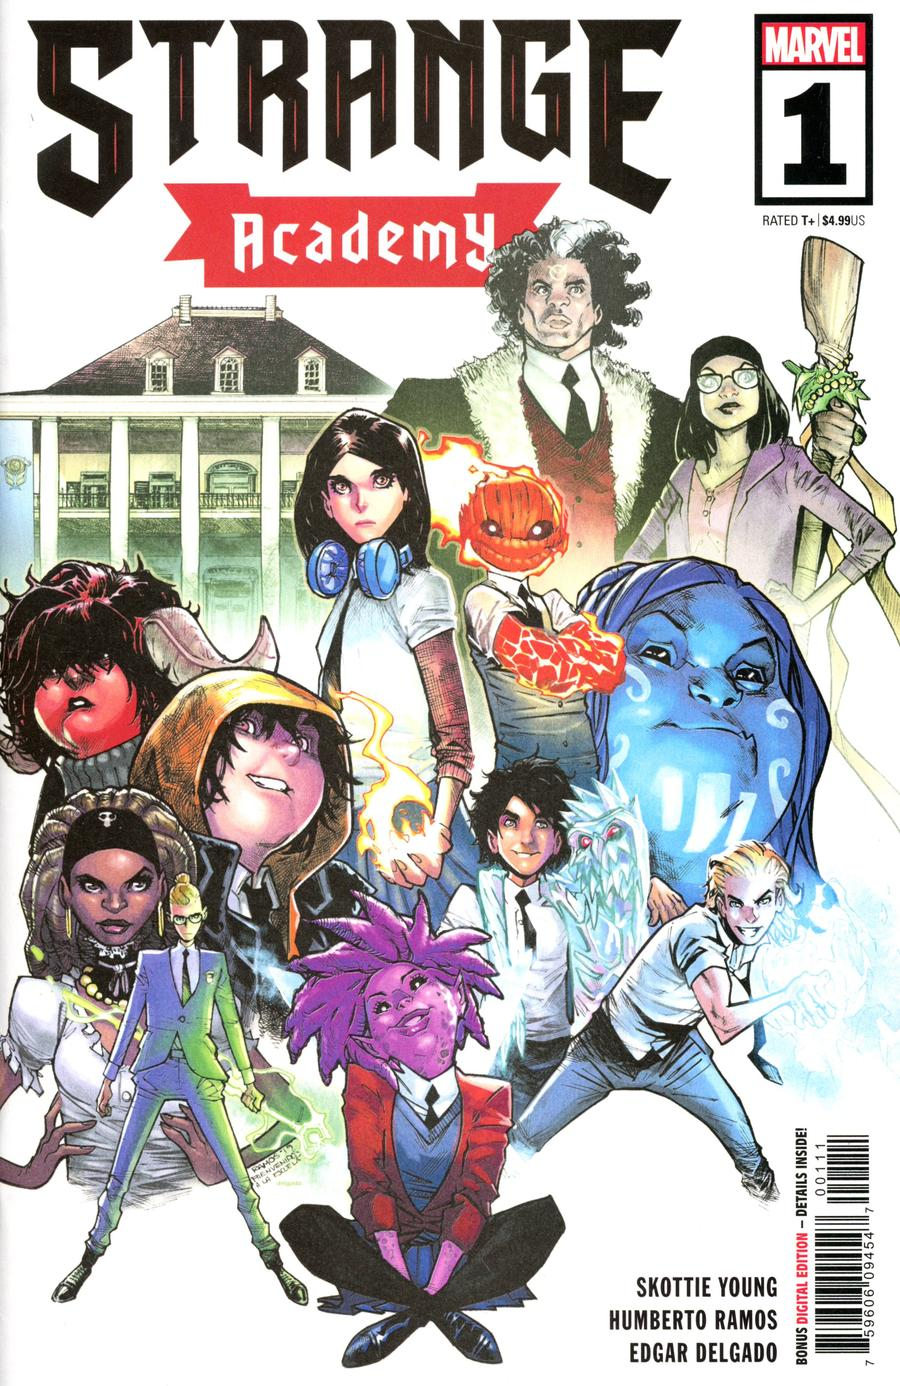 Strange Academy #1 Cover A 1st Ptg Regular Humberto Ramos Cover